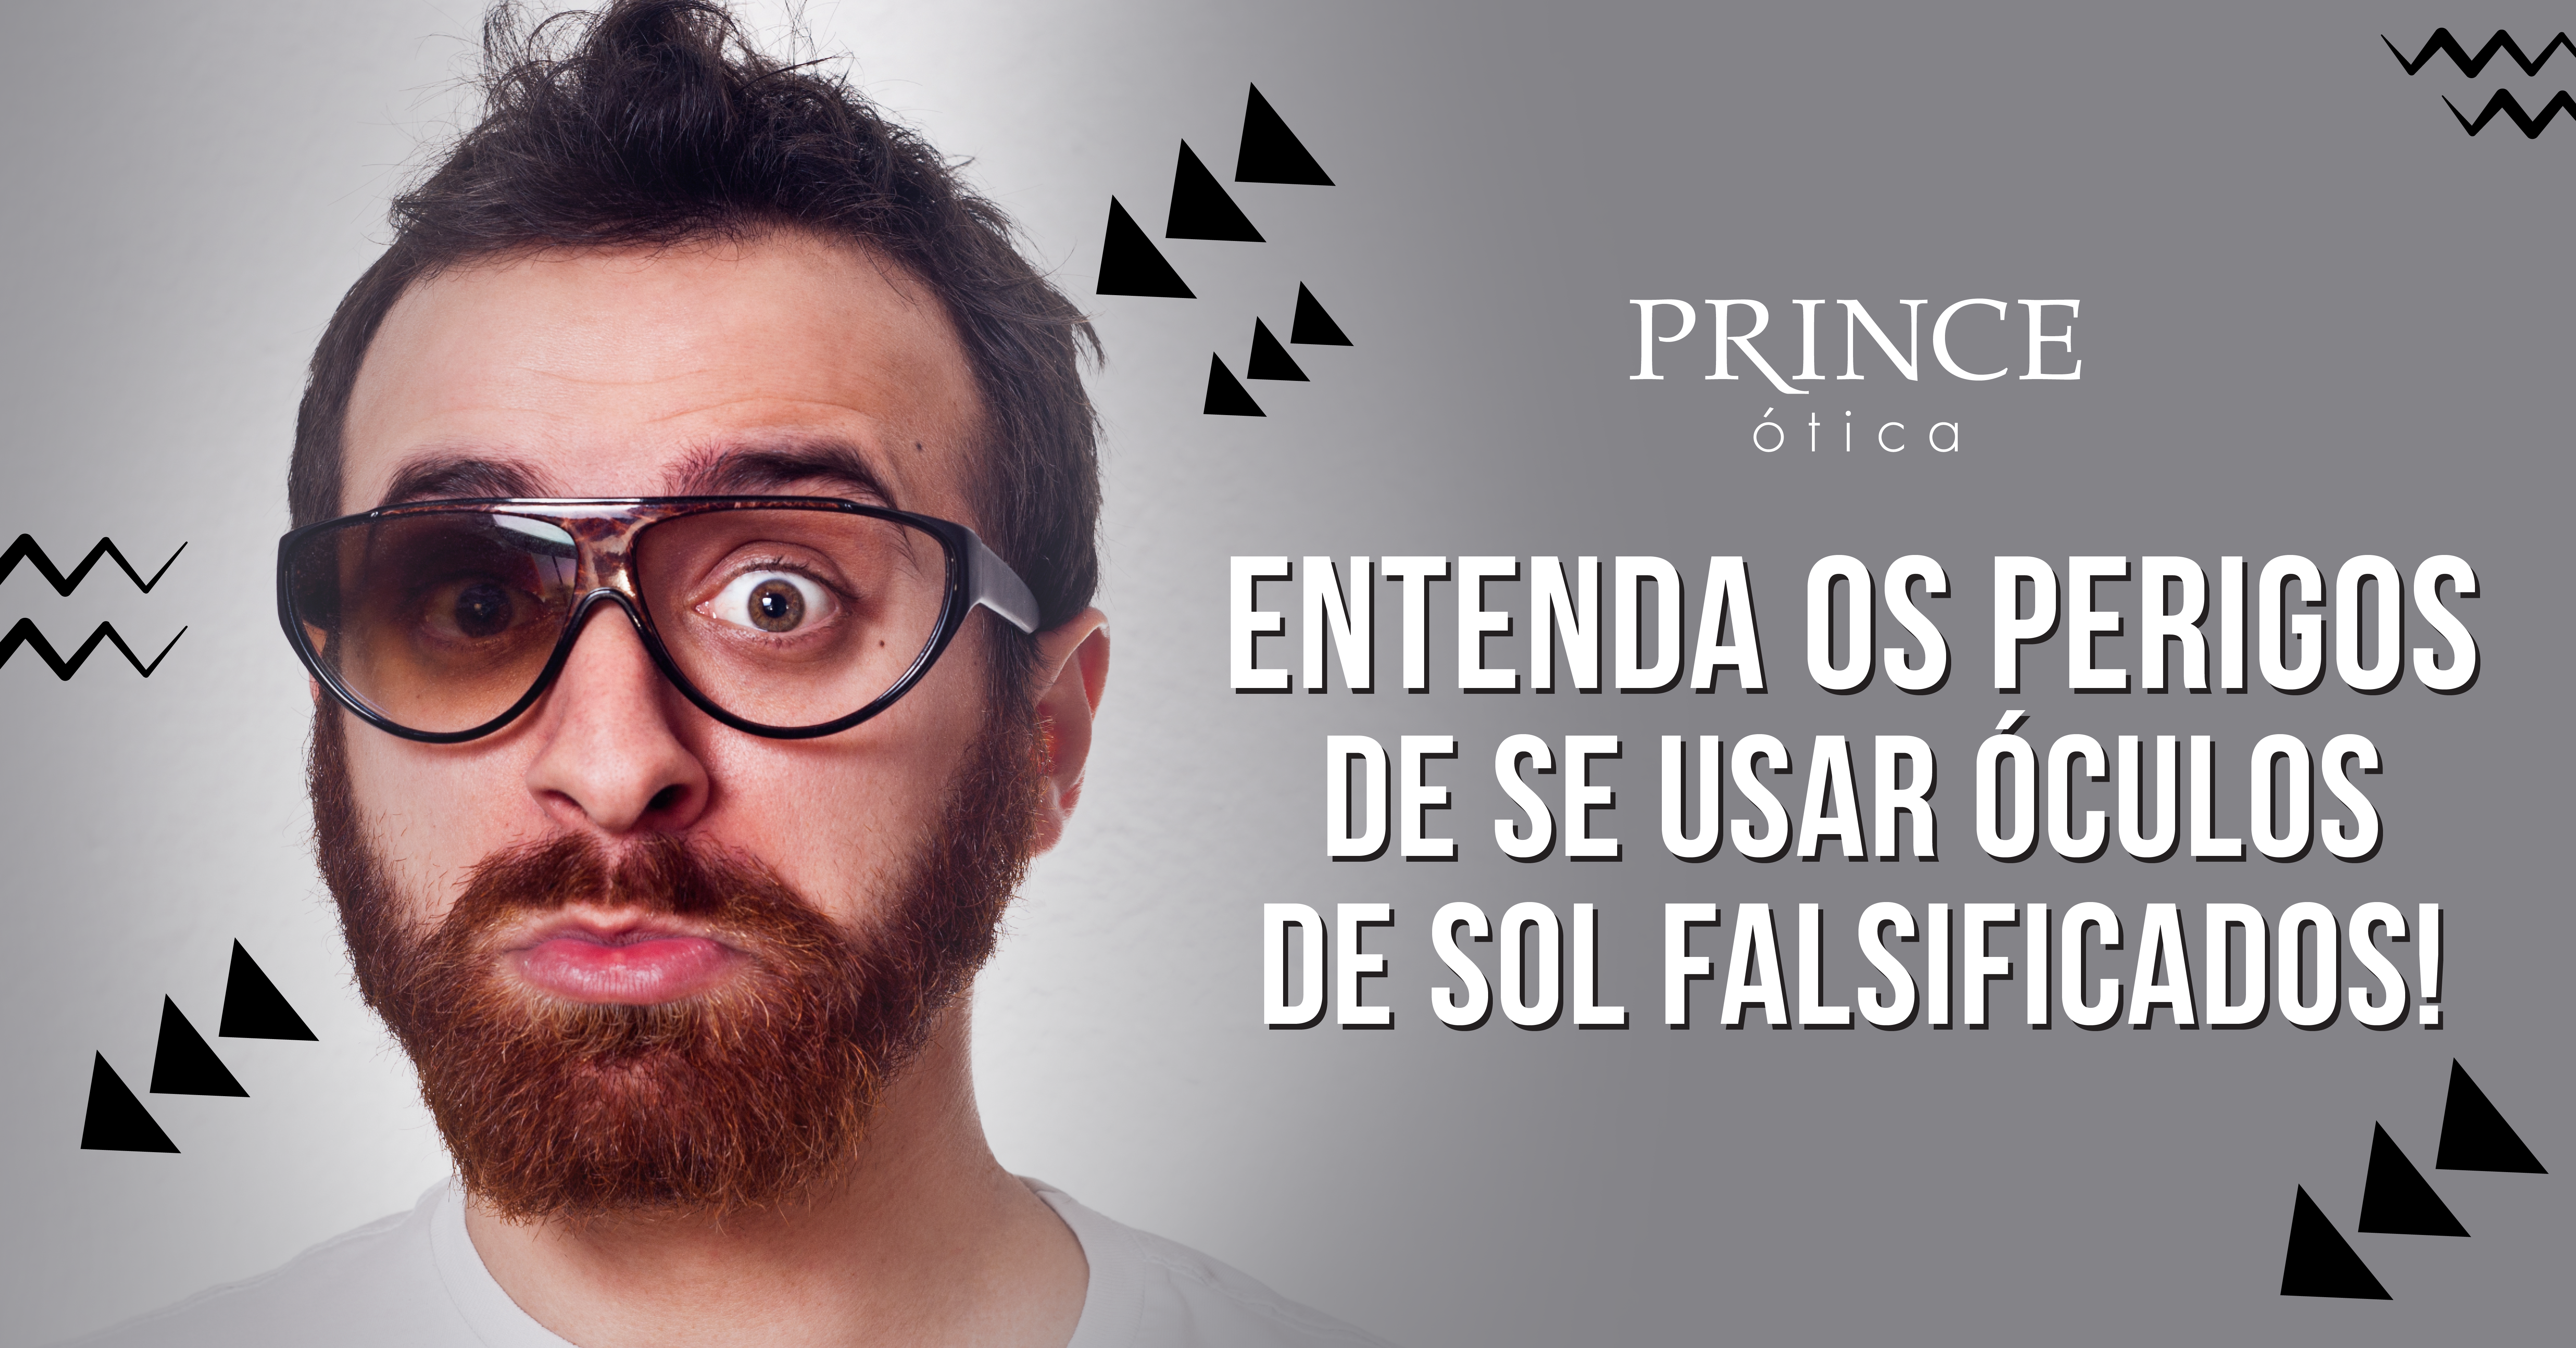 a5e502f48d2d1 Entenda os perigos de se usar óculos de sol falsificados!   Ótica Prince  Bauru